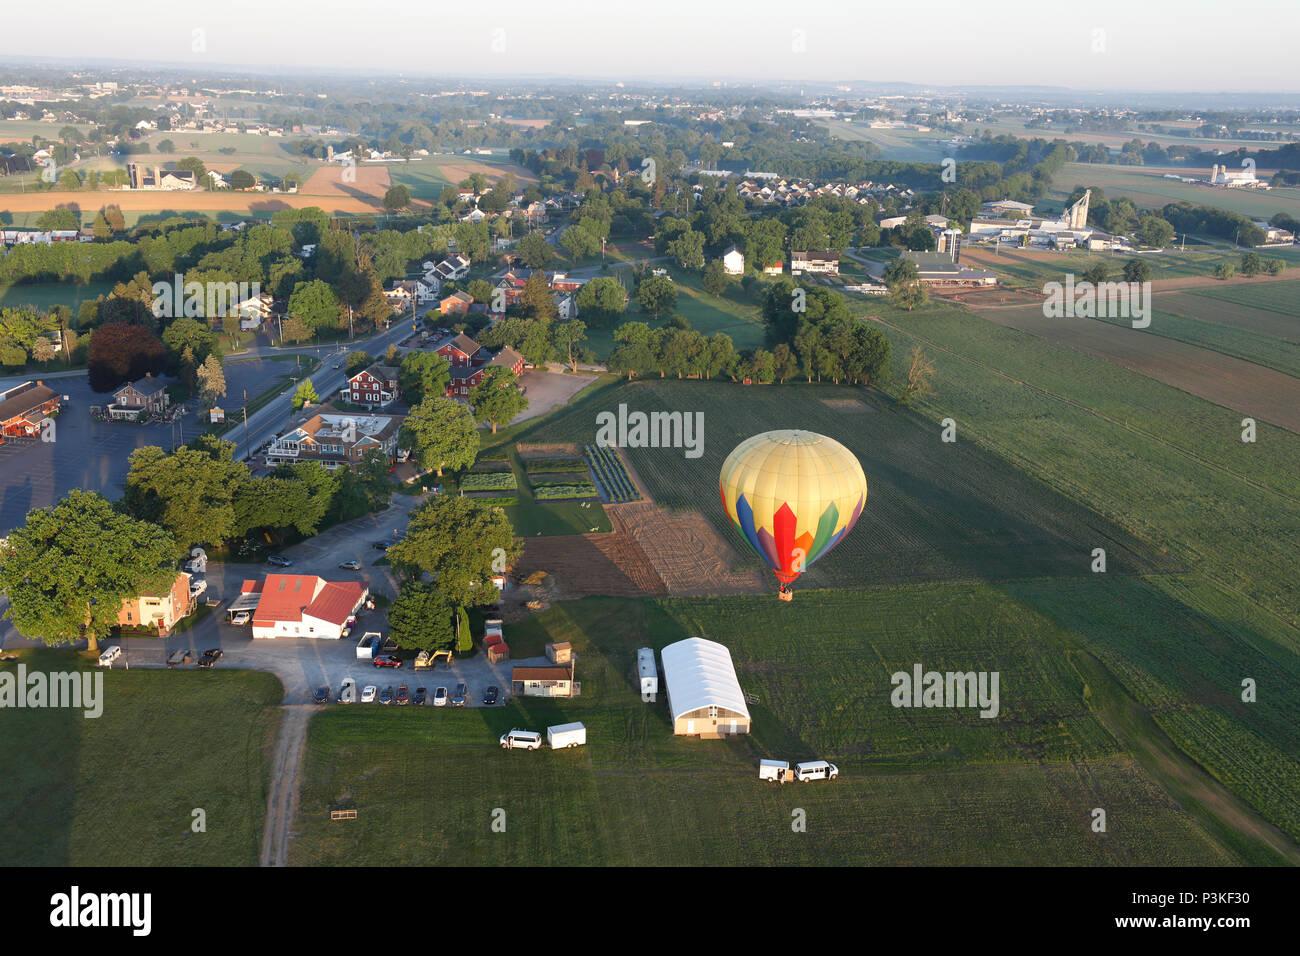 Aerial view of hot air balloon flying over farm, Lancaster County, Pennsylvania, USA Stock Photo